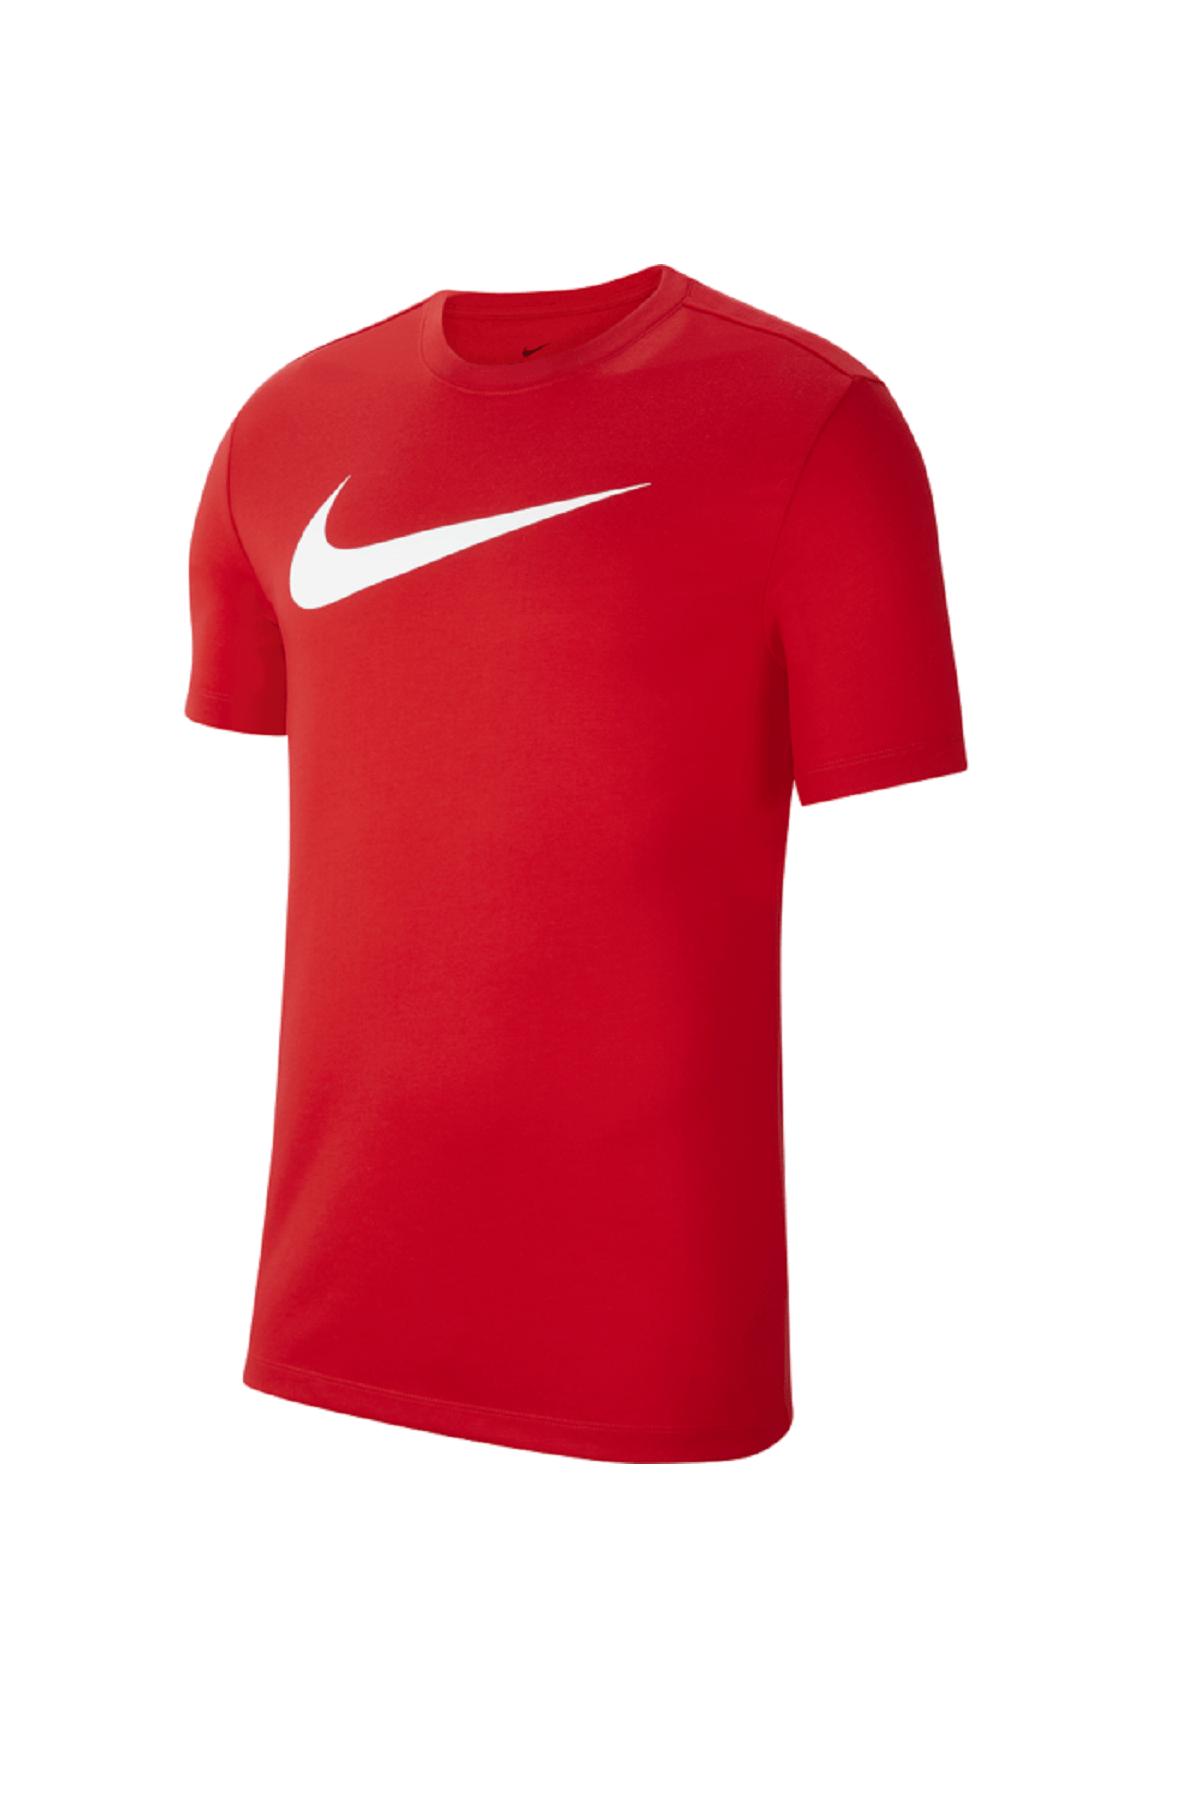 Nike Unisex Spor T-Shirt - Dri-Fit Park - CW6941-657